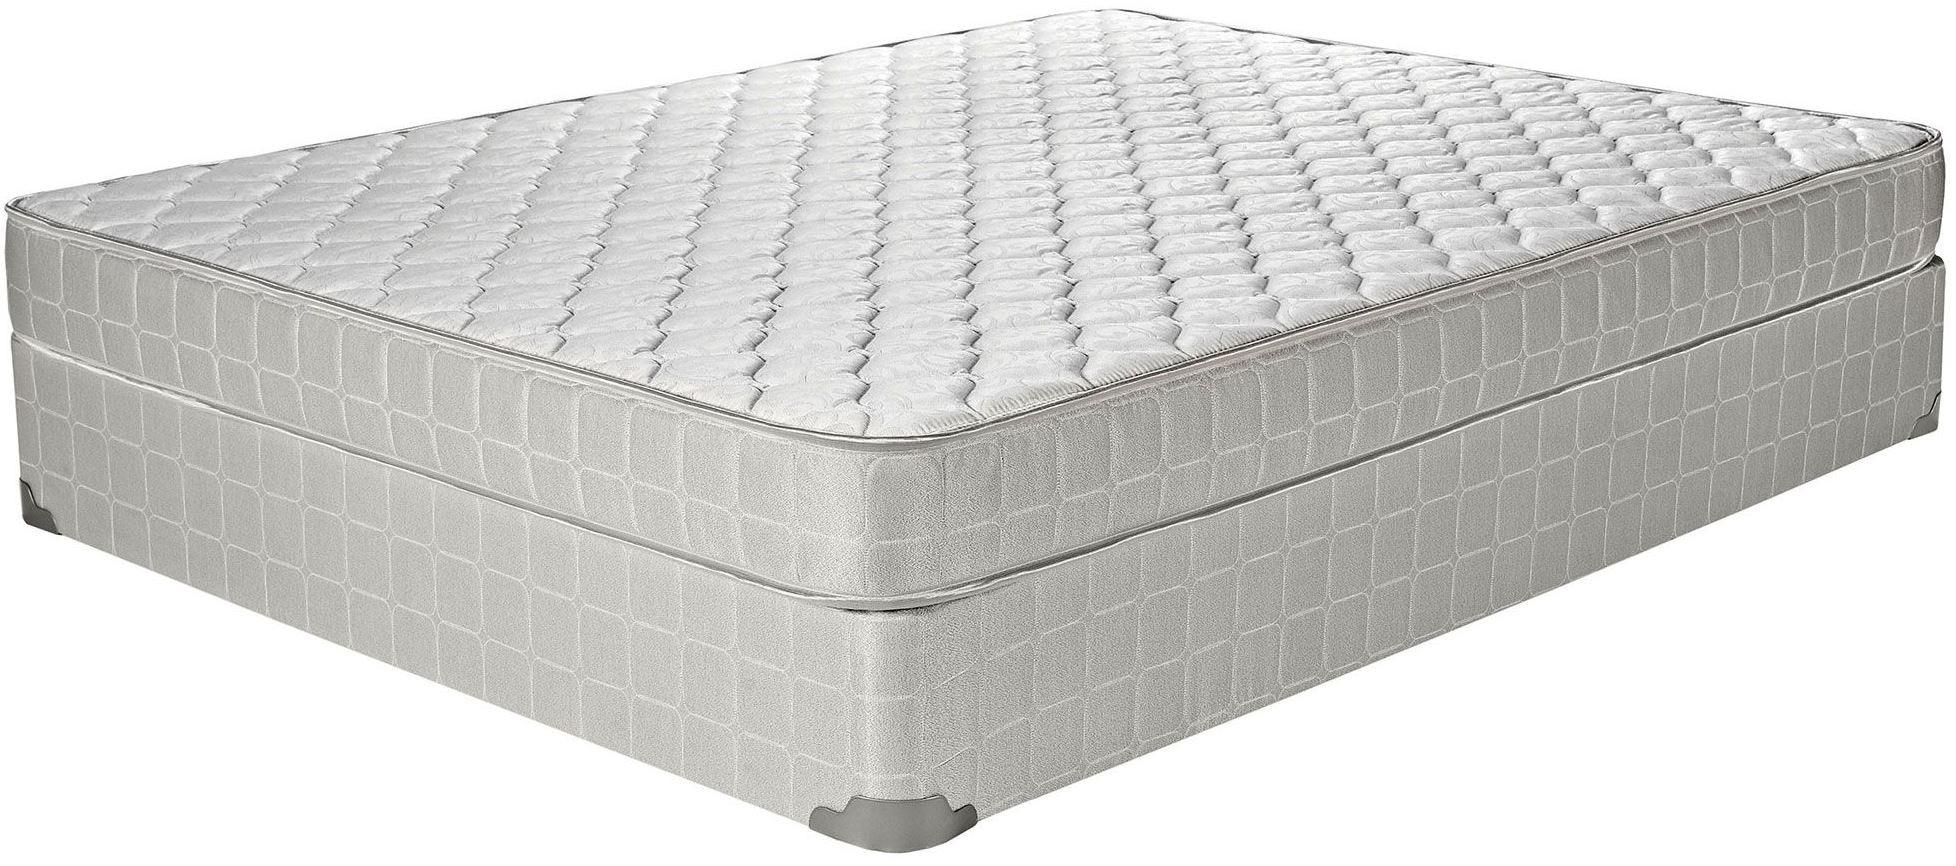 Santa Barbara Ii Gray Twin Size Foam Mattress 350052t Coaster Furniture